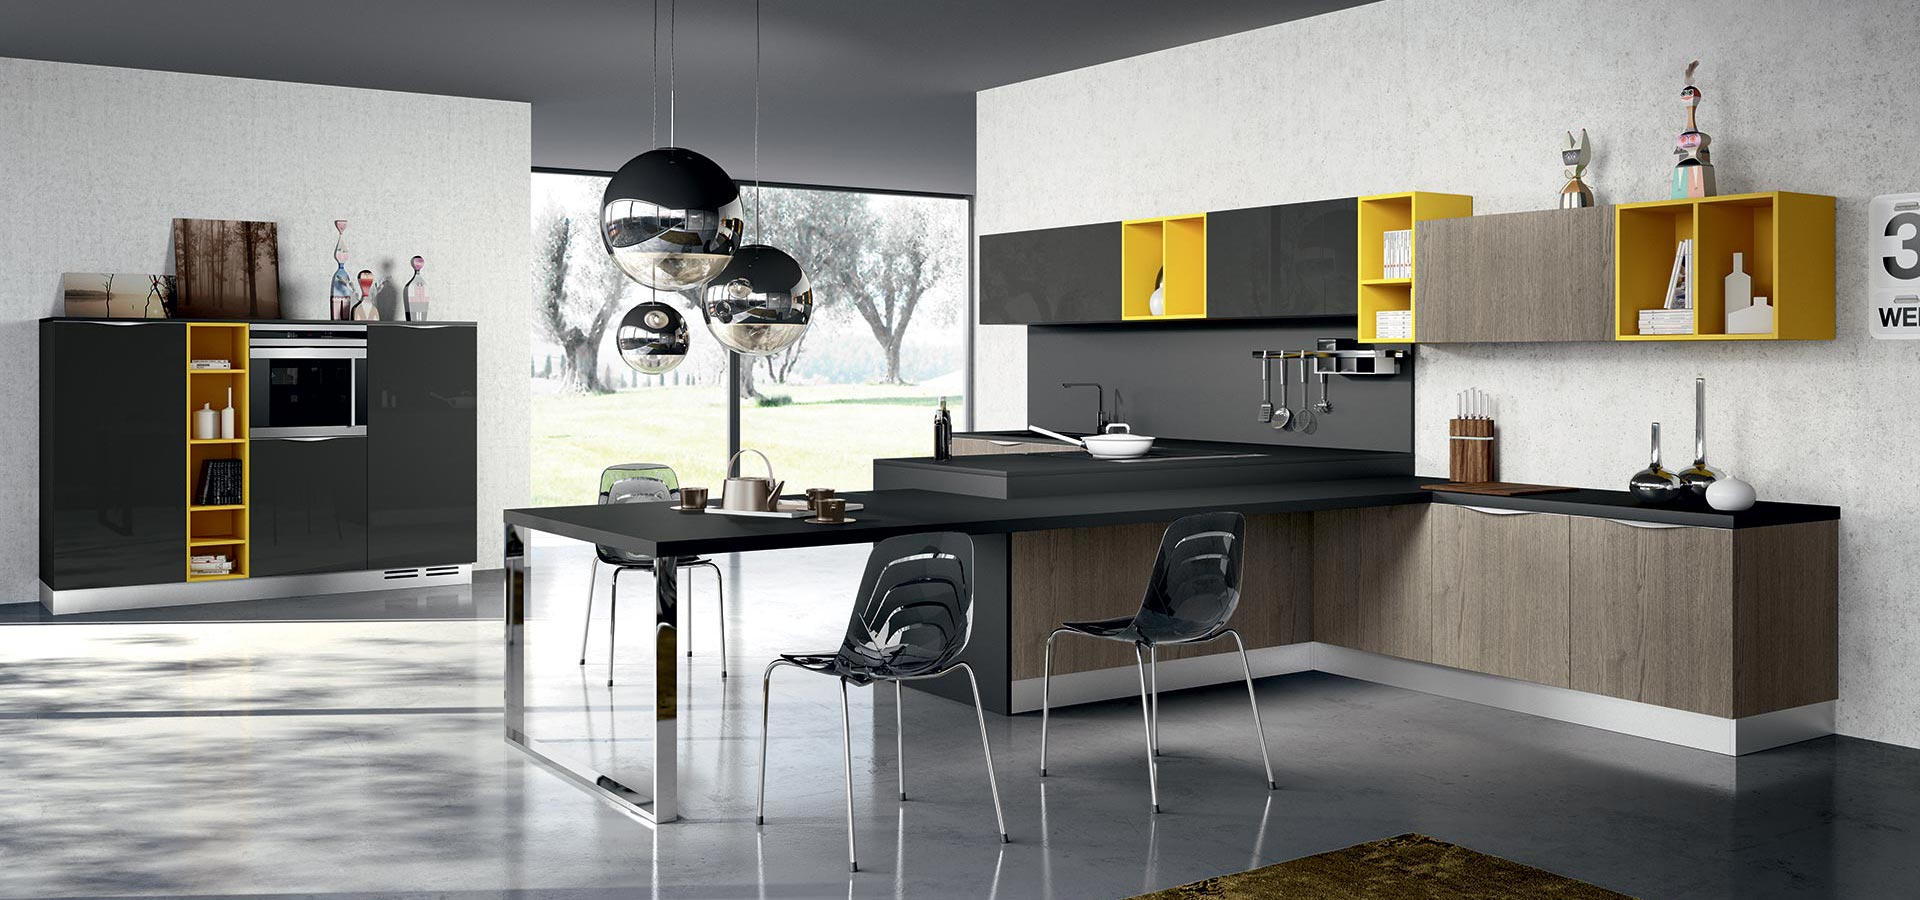 Arredo3 Cucine Ikea - Modelos De Casas - Justrigs.com